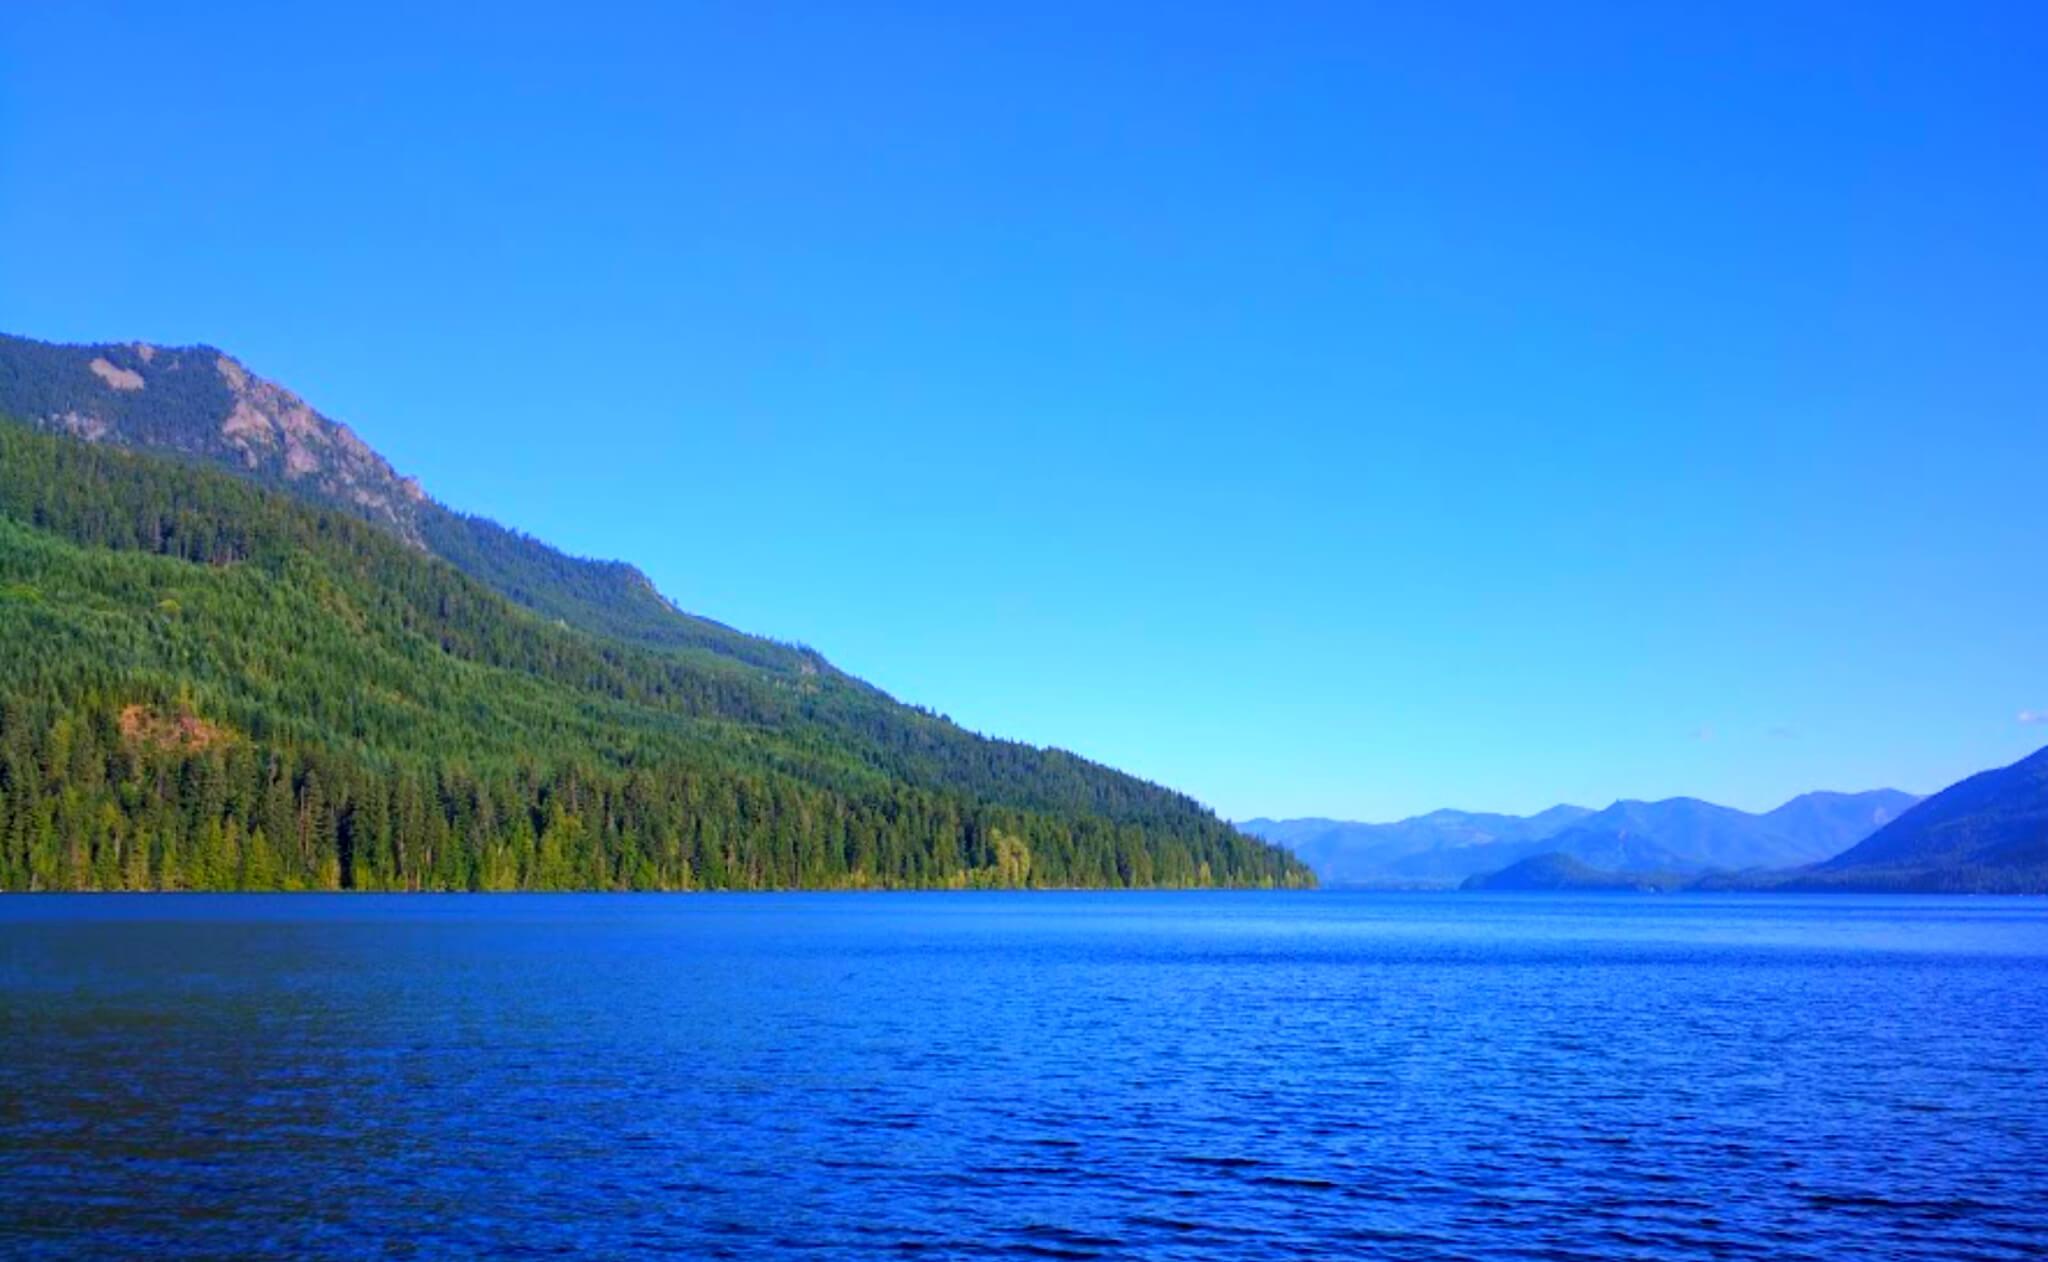 Kachess-Lake-Fishing-Report-Guide-Washington-WA-01